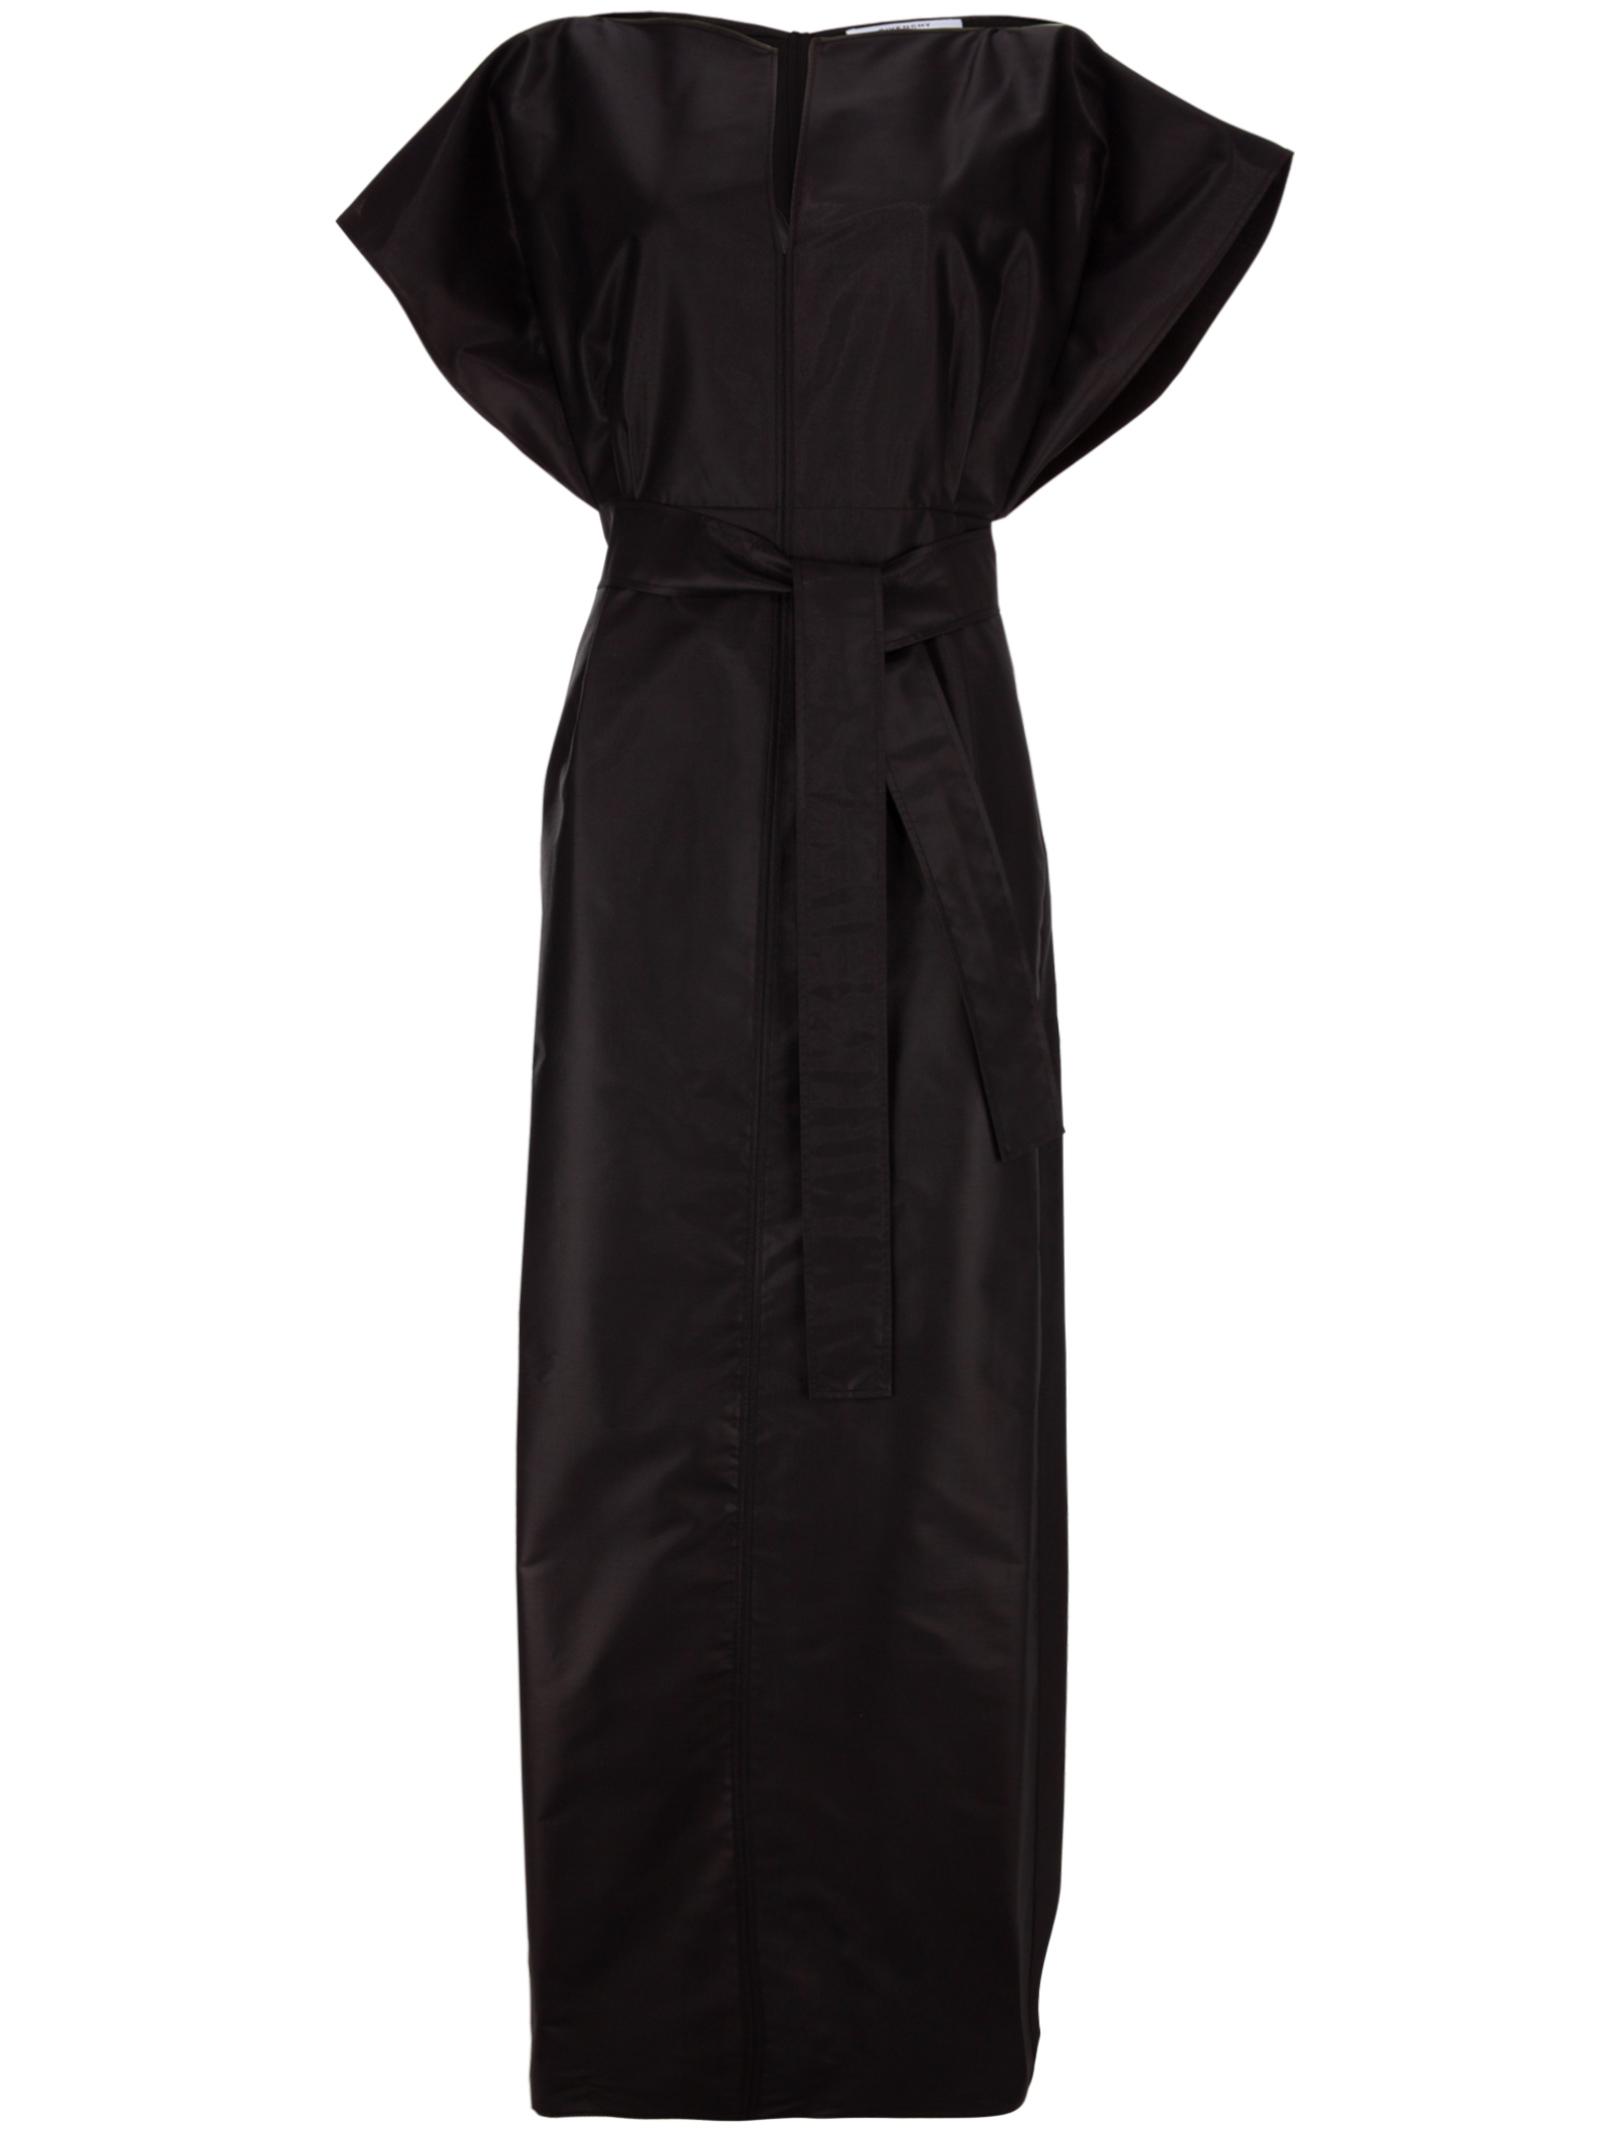 6fd9b31f43 Givenchy dress - Givenchy - Michele Franzese Moda